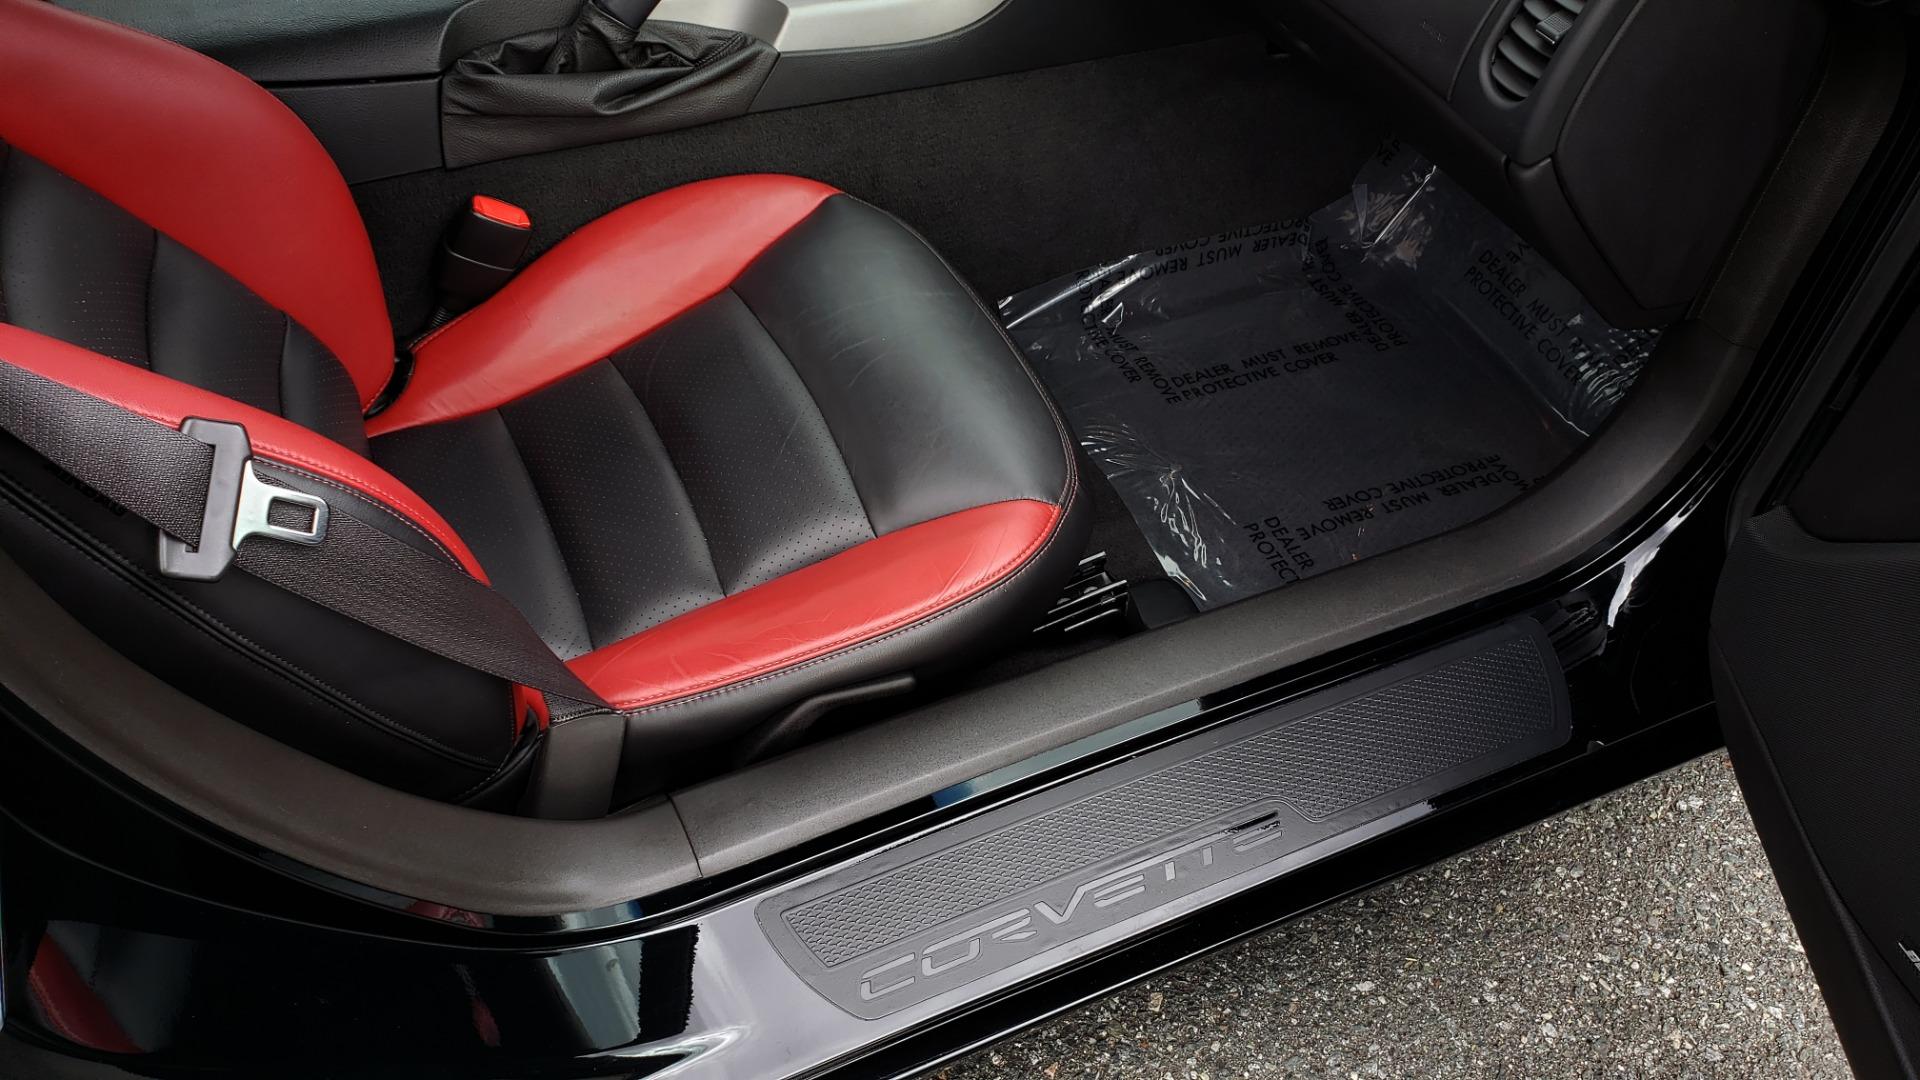 Used 2007 Chevrolet CORVETTE Z06 2LZ / 7.0L 427 V8 / 6-SPD MAN / BOSE / POLISHED WHEELS for sale Sold at Formula Imports in Charlotte NC 28227 83